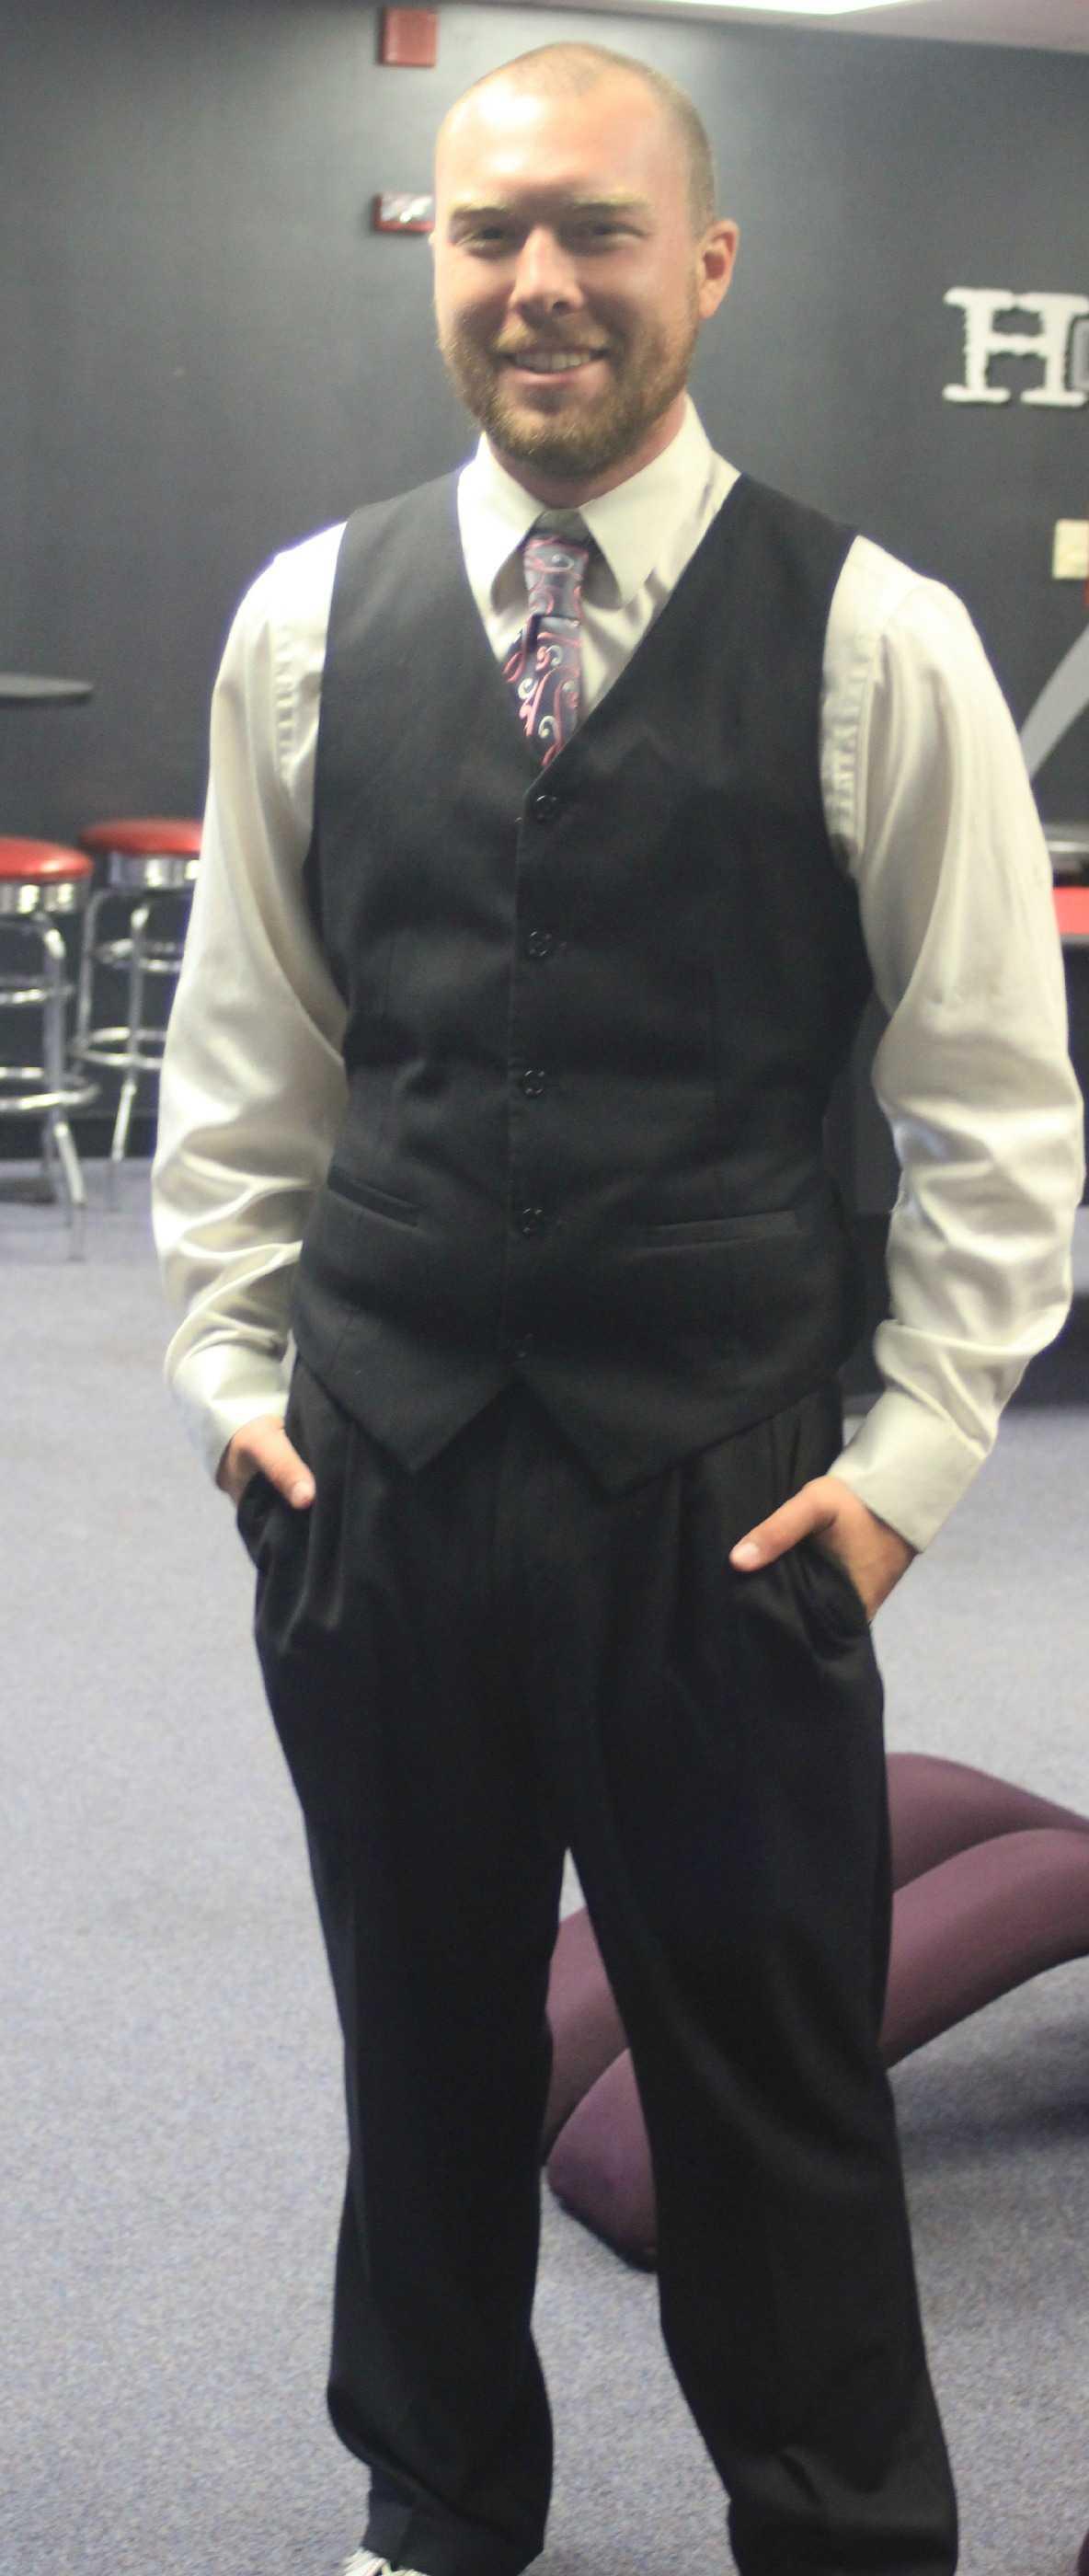 Best dressed male